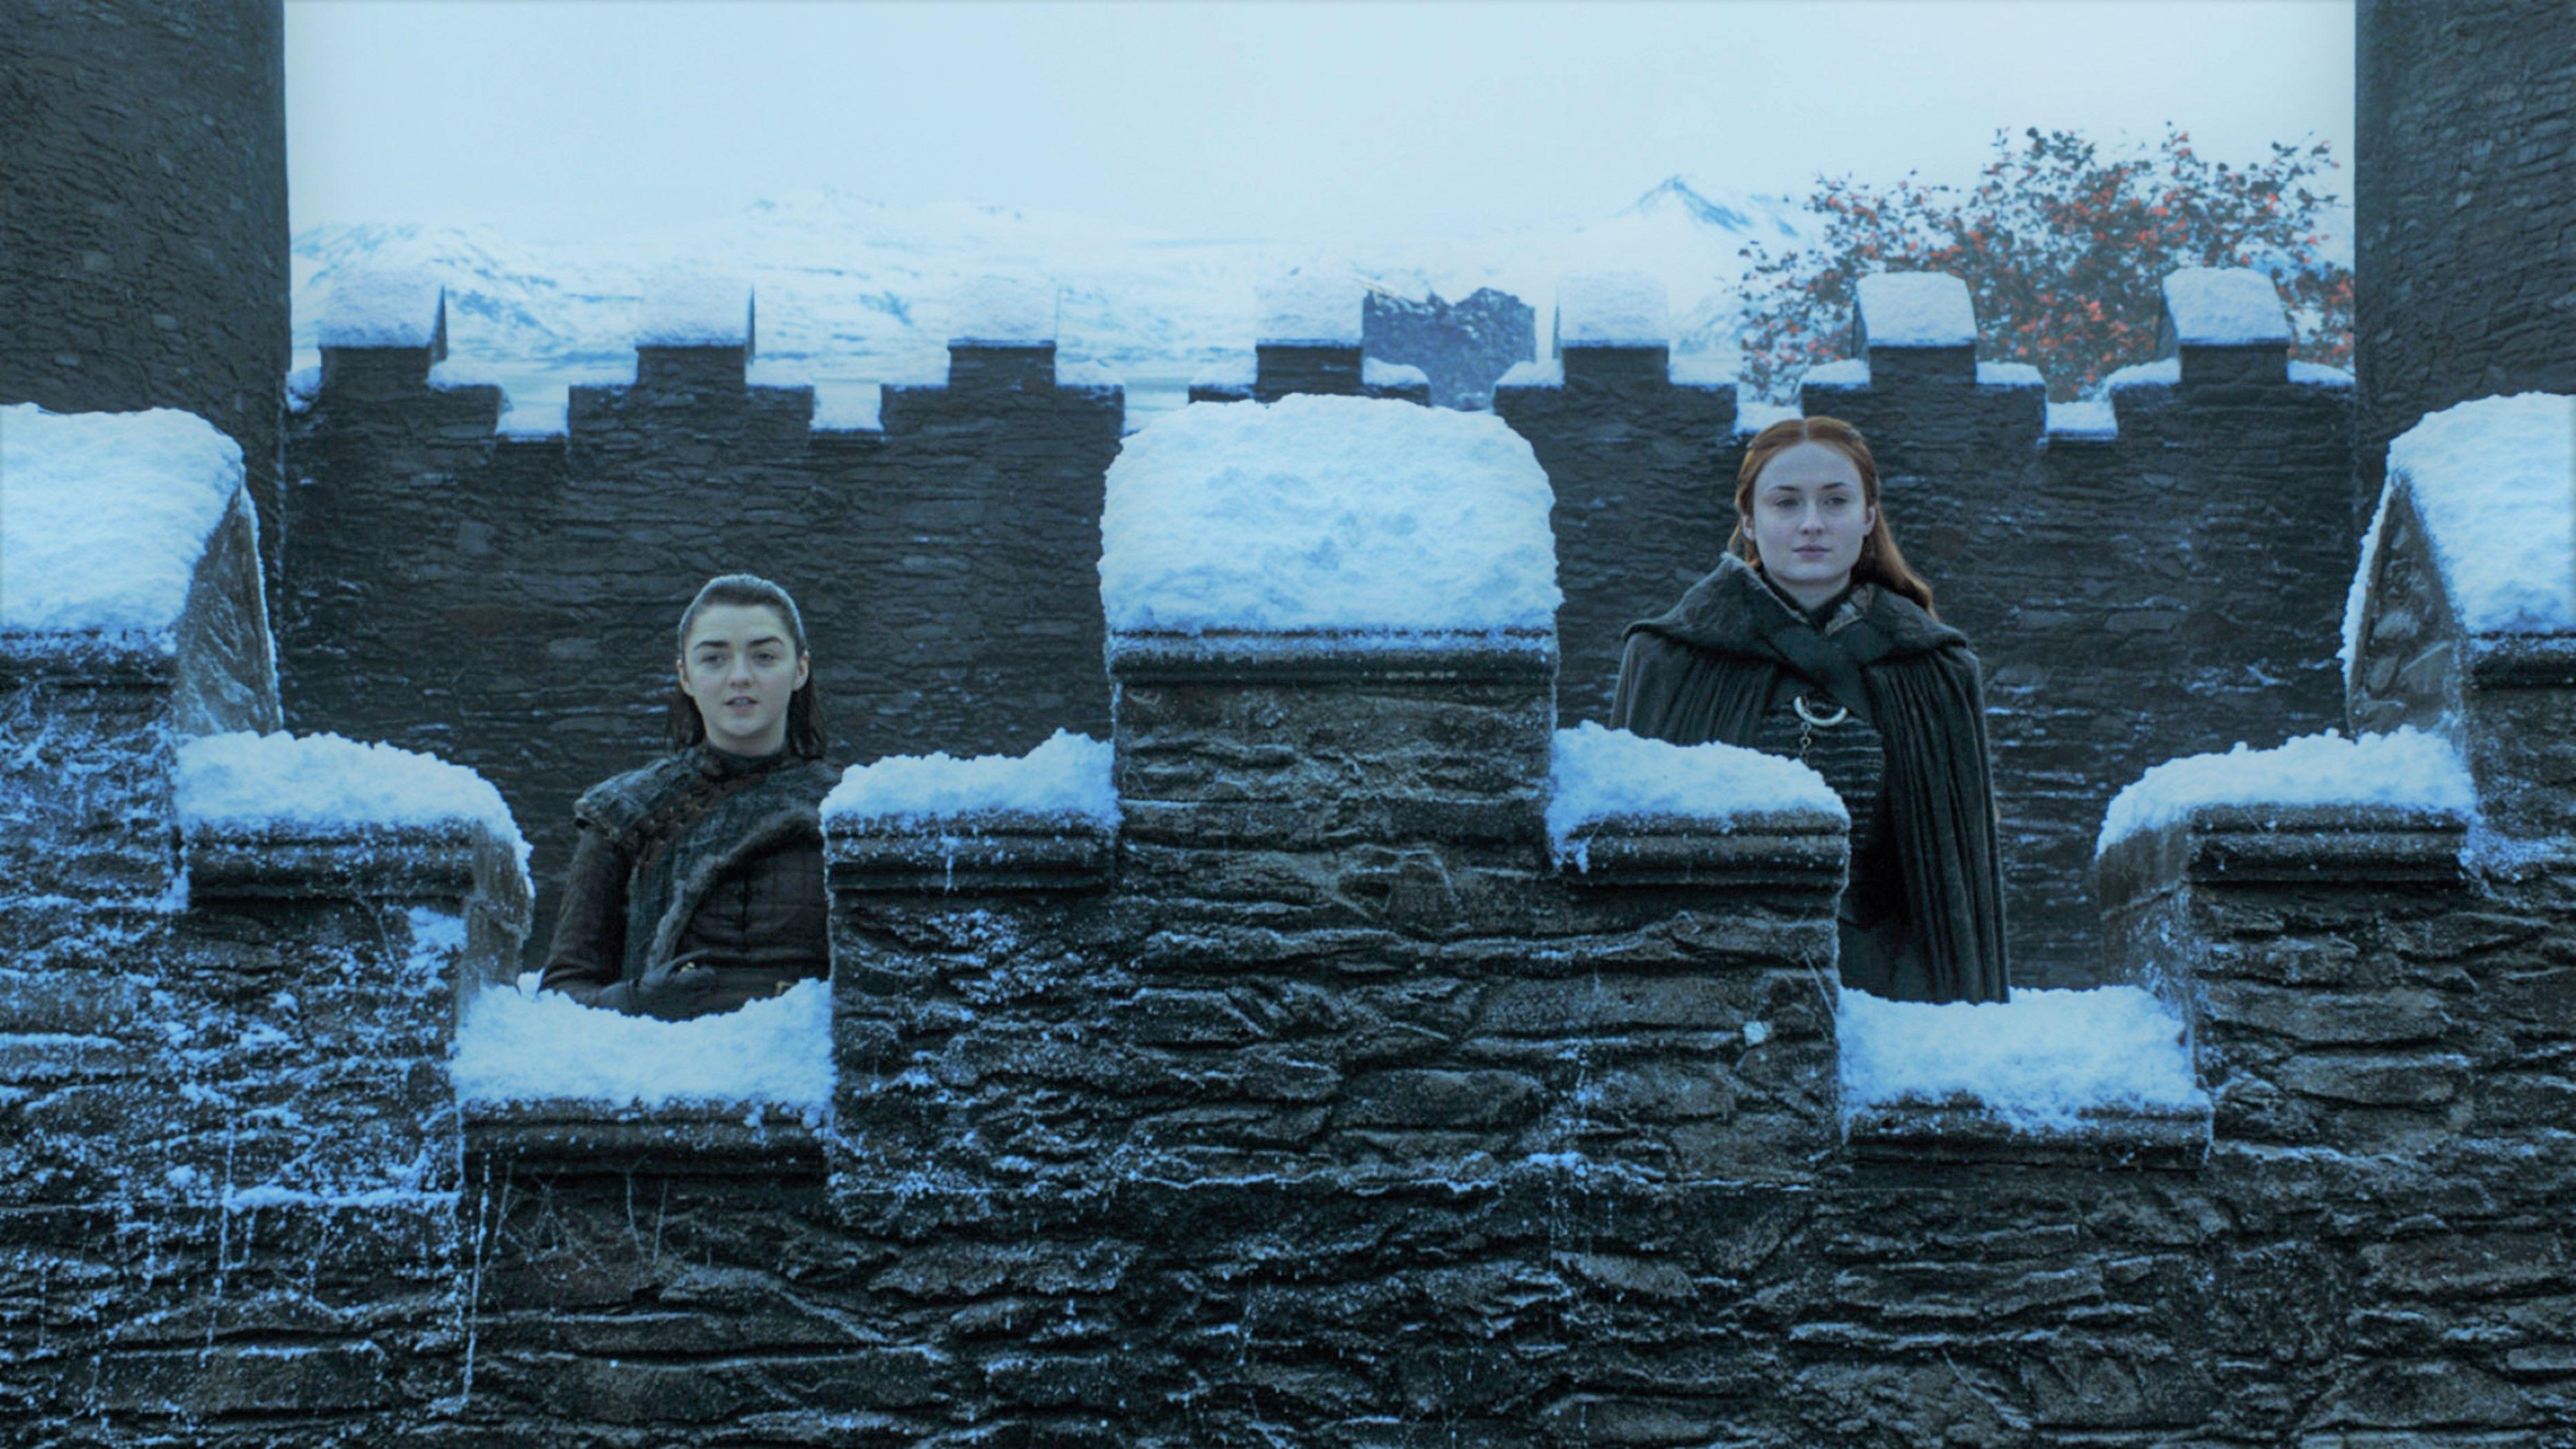 Arya and Sansa Winterfell Game of Thrones